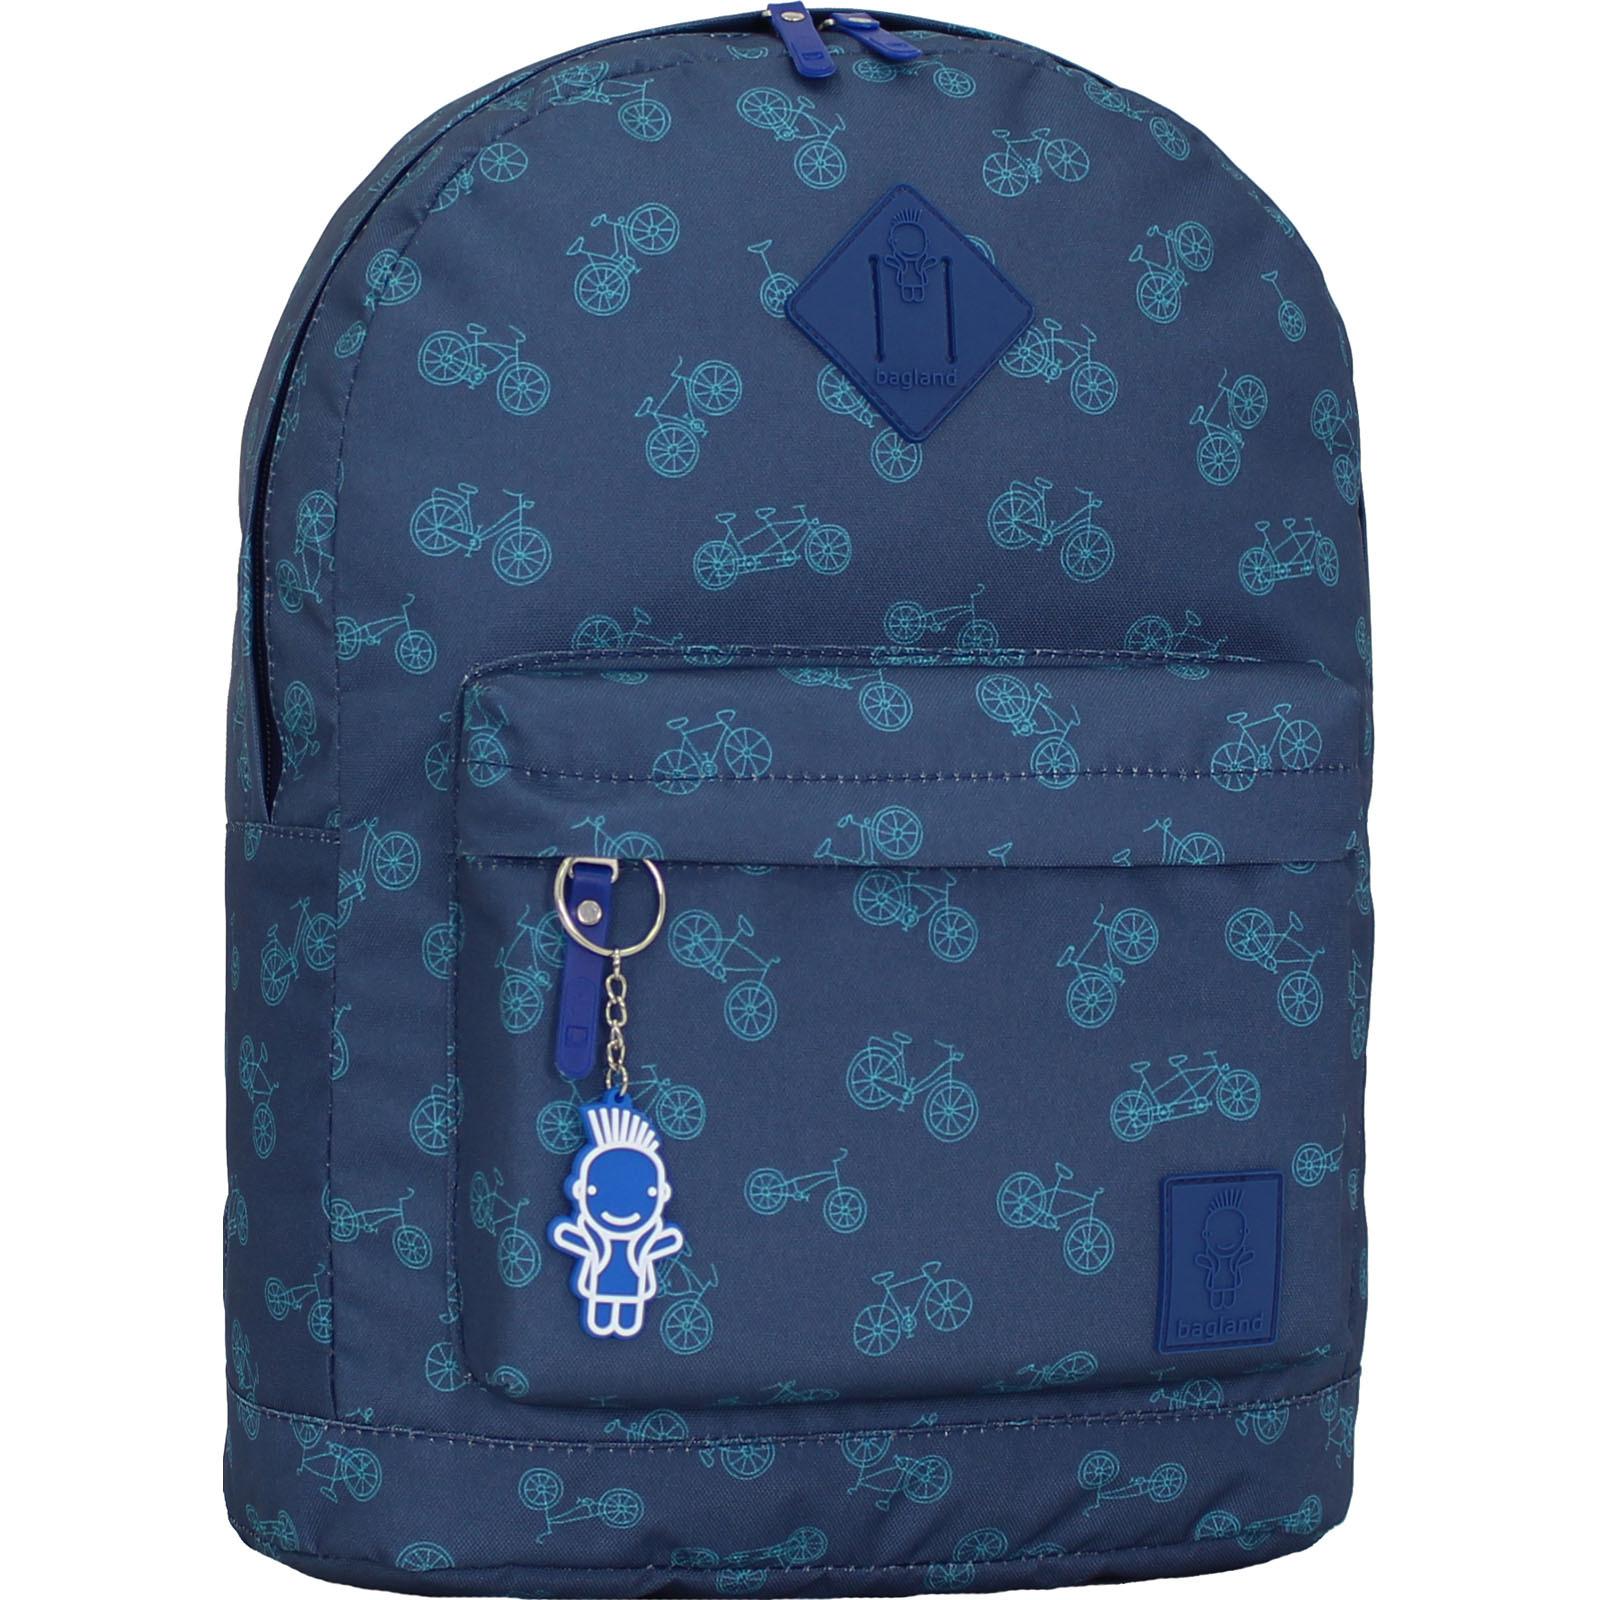 Городские рюкзаки Рюкзак Bagland Молодежный (дизайн) 17 л. сублимация 340 (00533664) IMG_1117_340.JPG